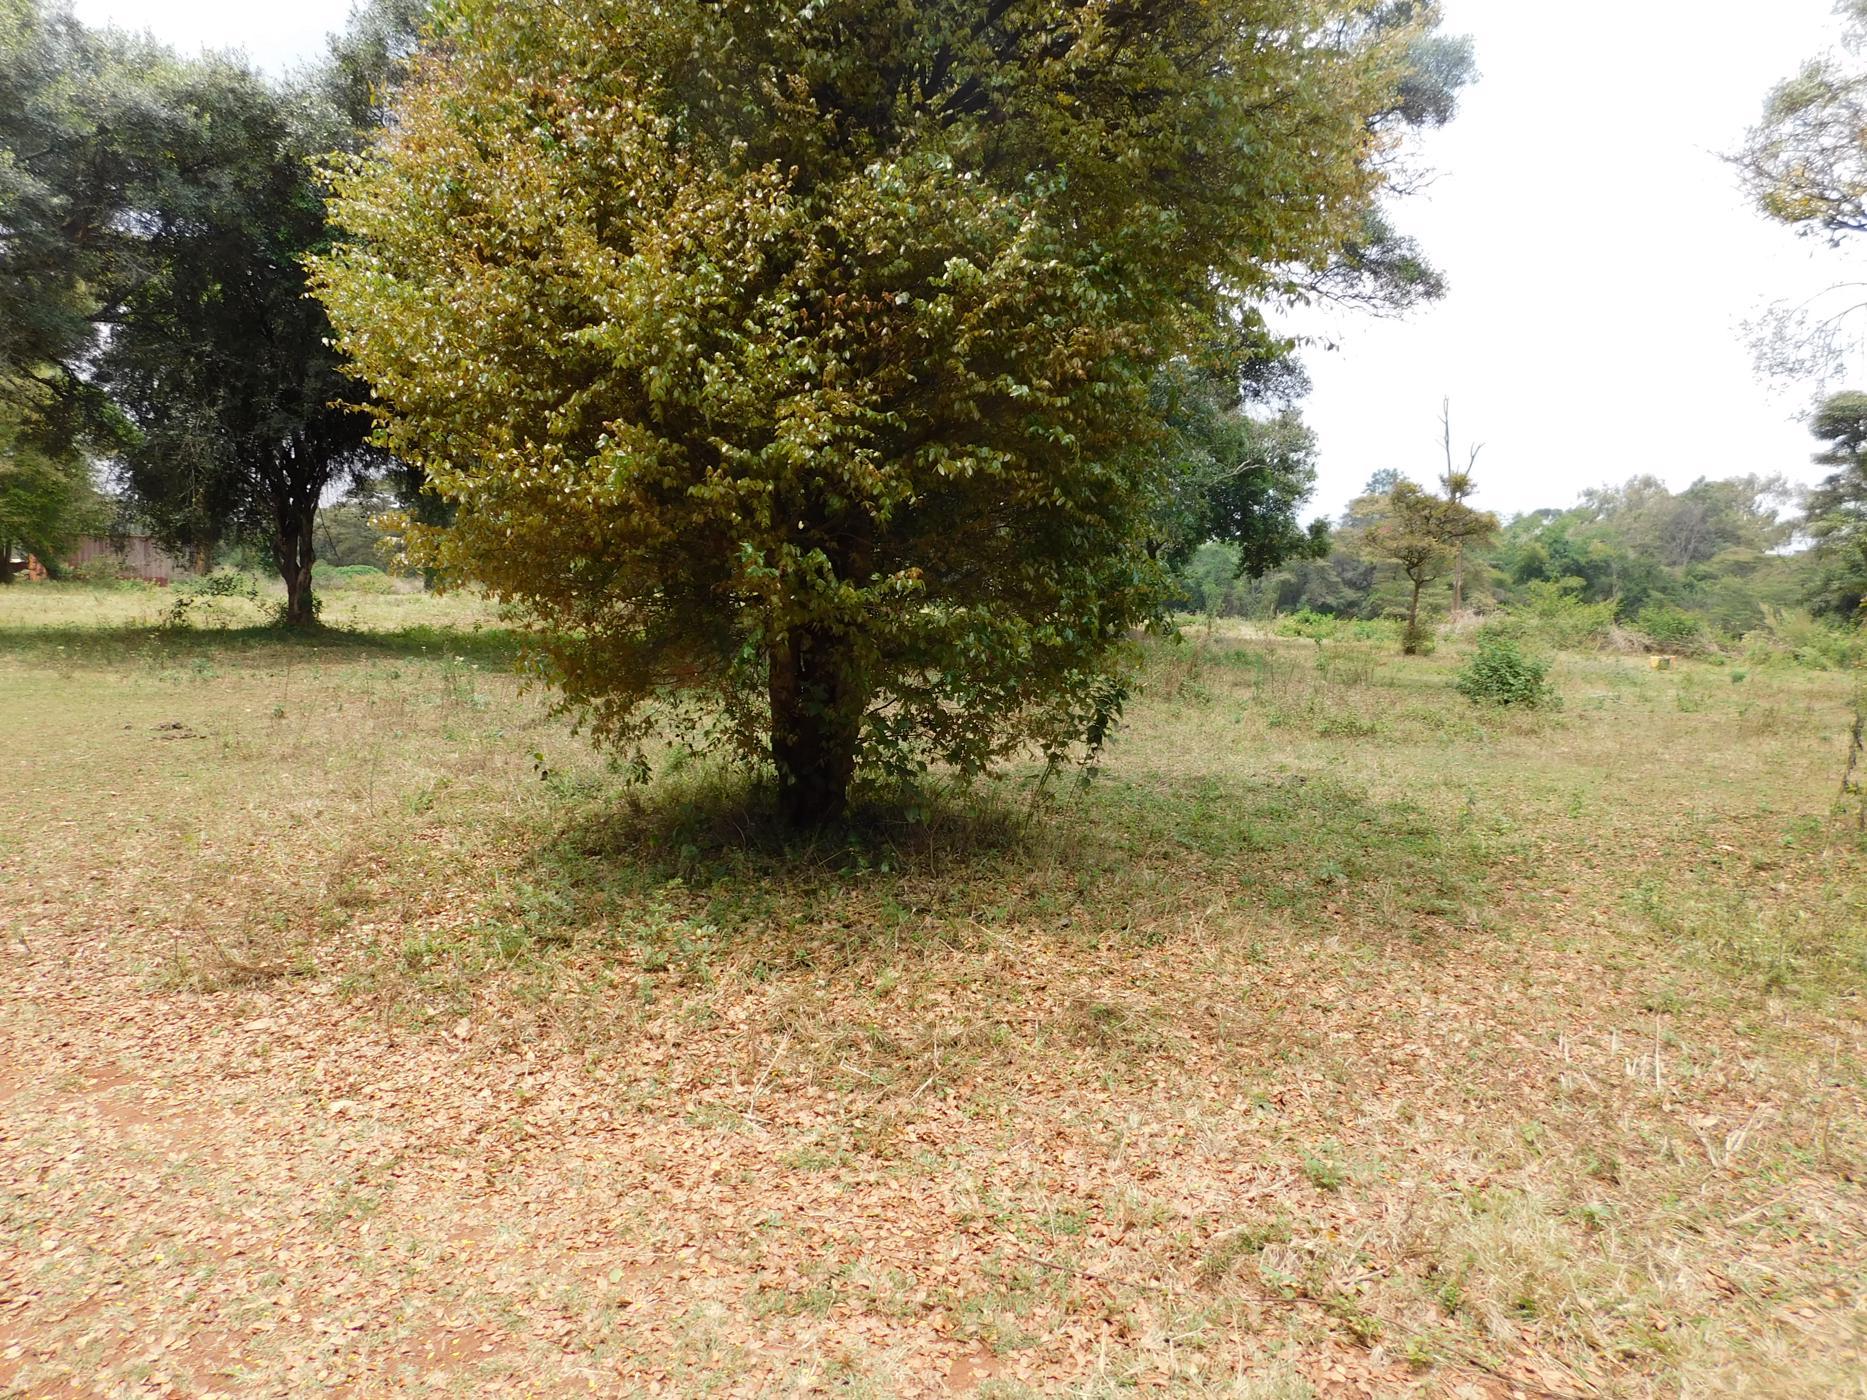 9 acres vacant land for sale in Karen (Kenya)